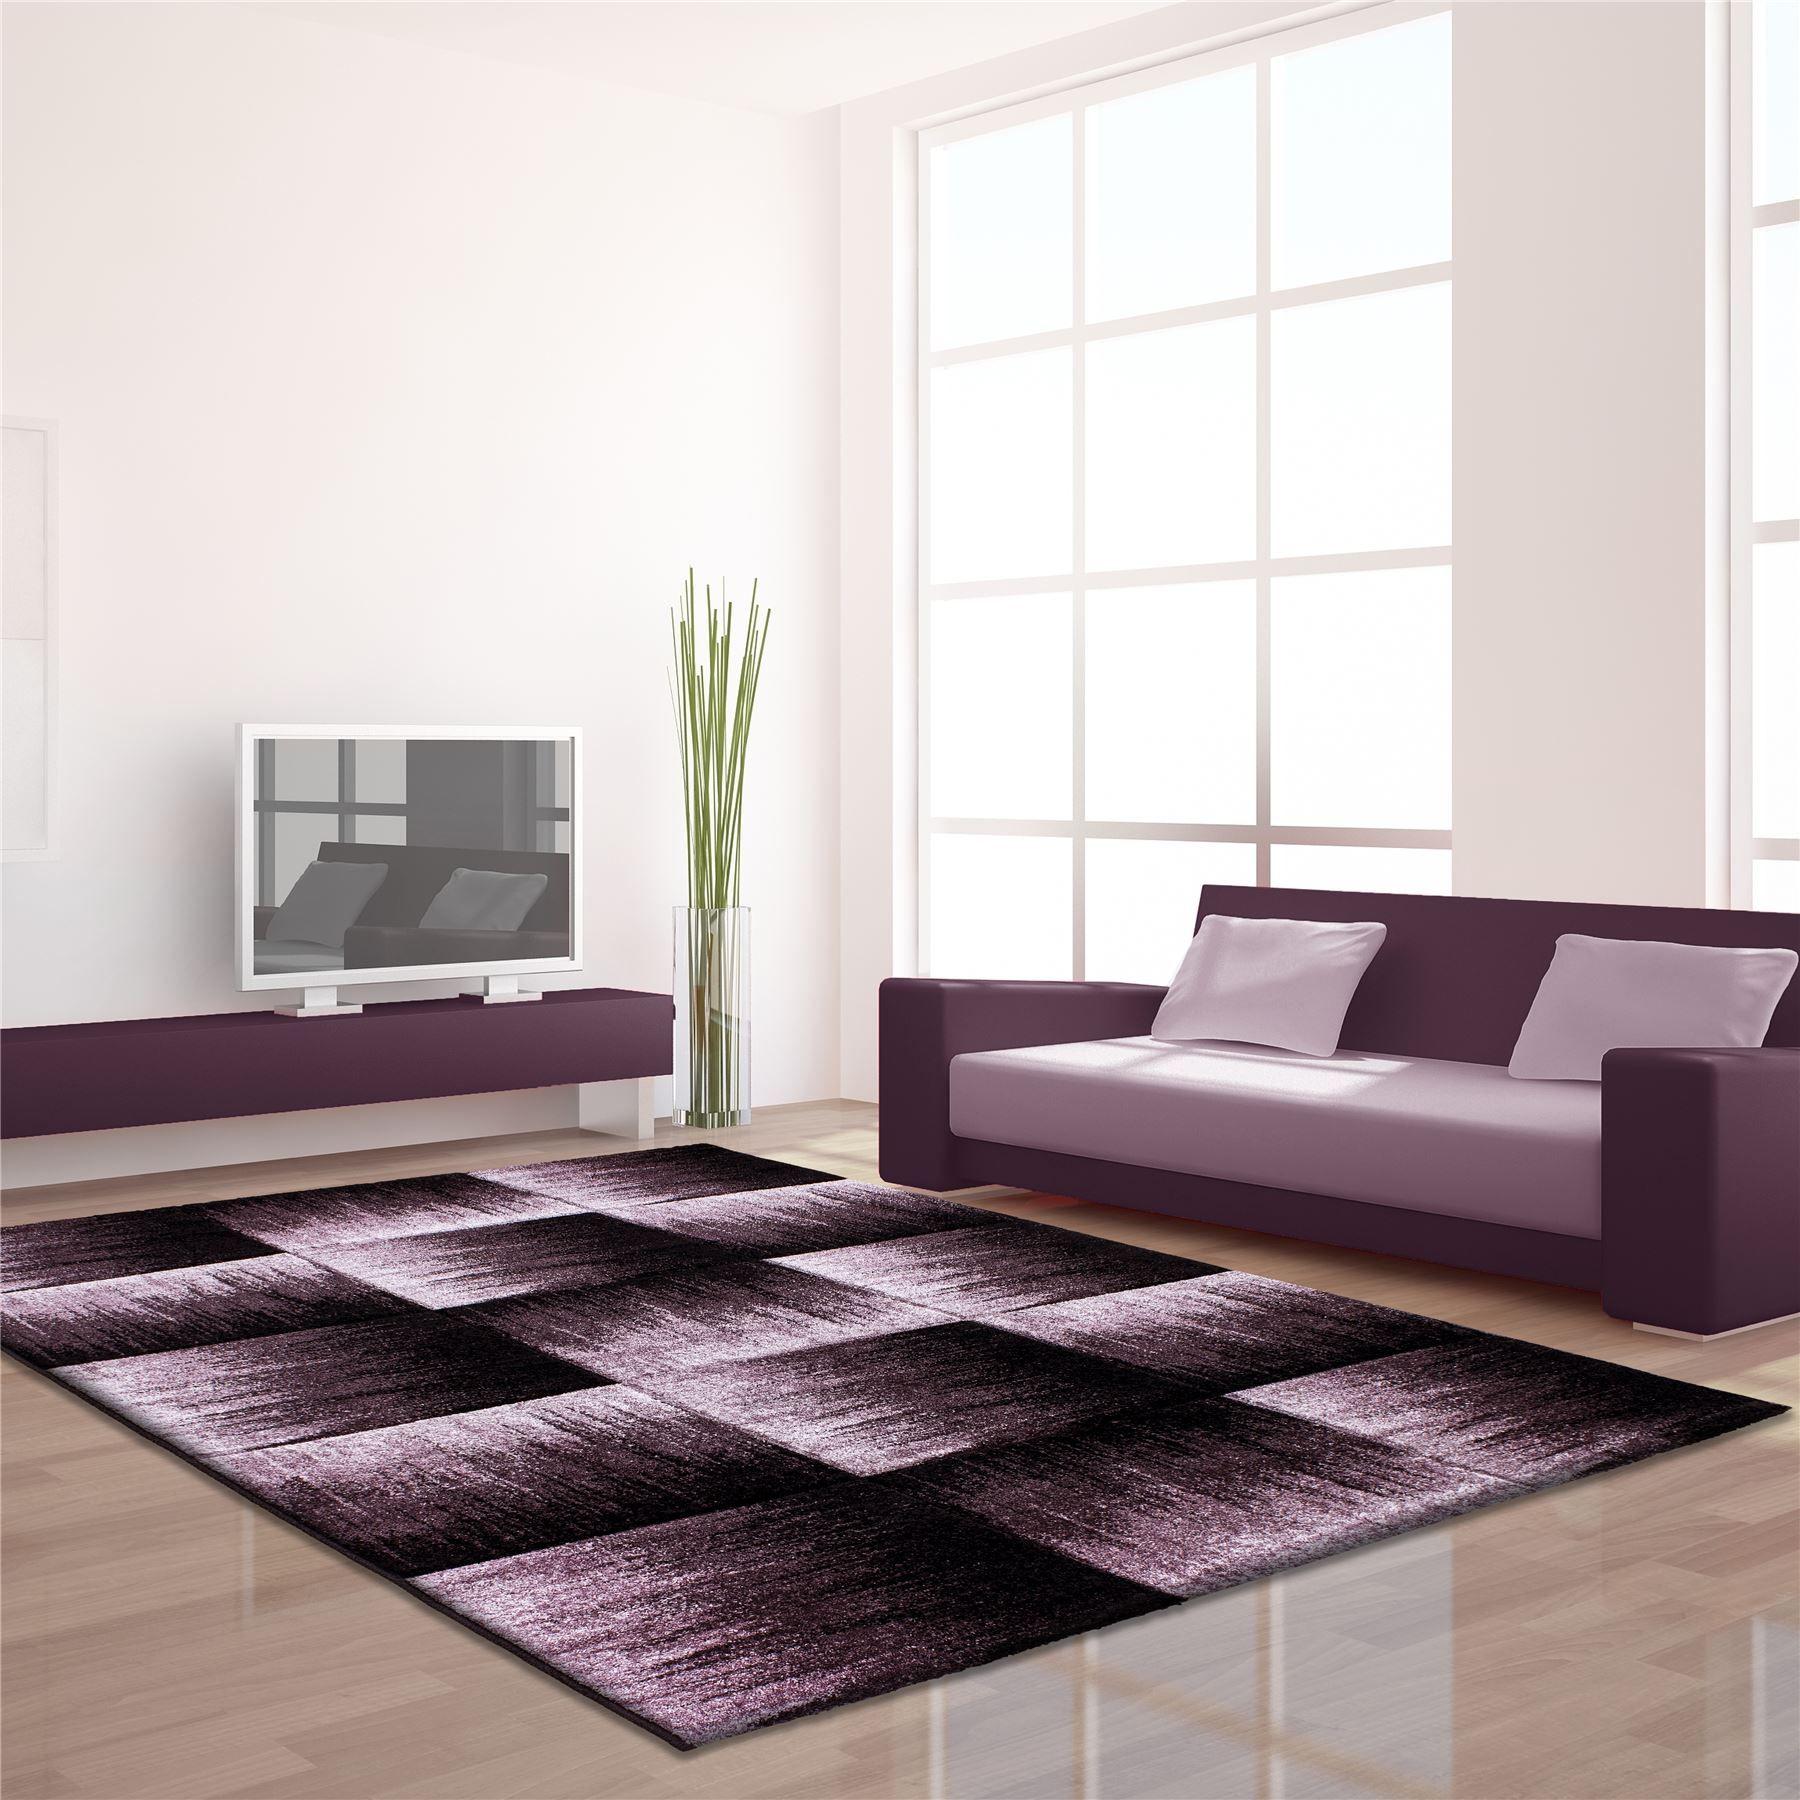 Modern Contemporary Black Grey Brown Purple Grey Swirls Squares Quality Rug Purple Area Rugs Carpet Design Quality Rugs